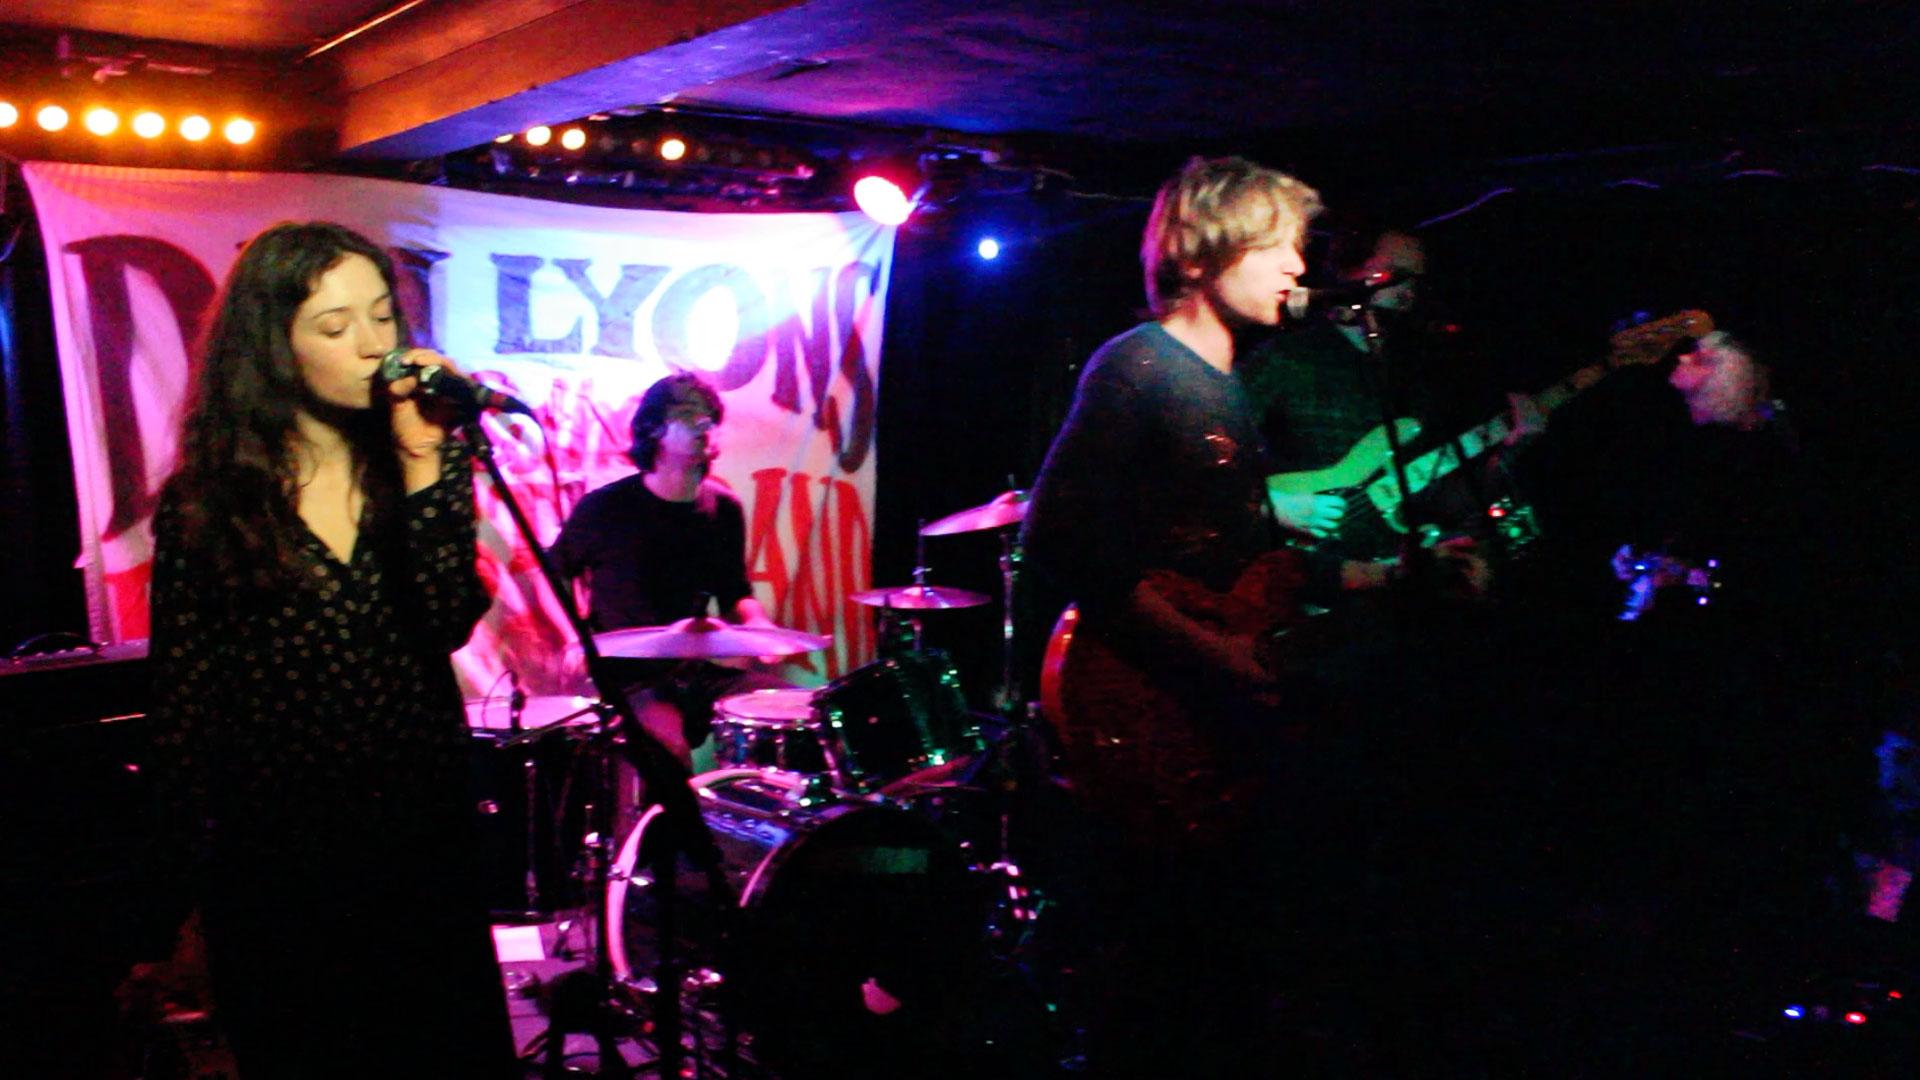 Dan Lyons & The Fantastic Band play Sebright Arms